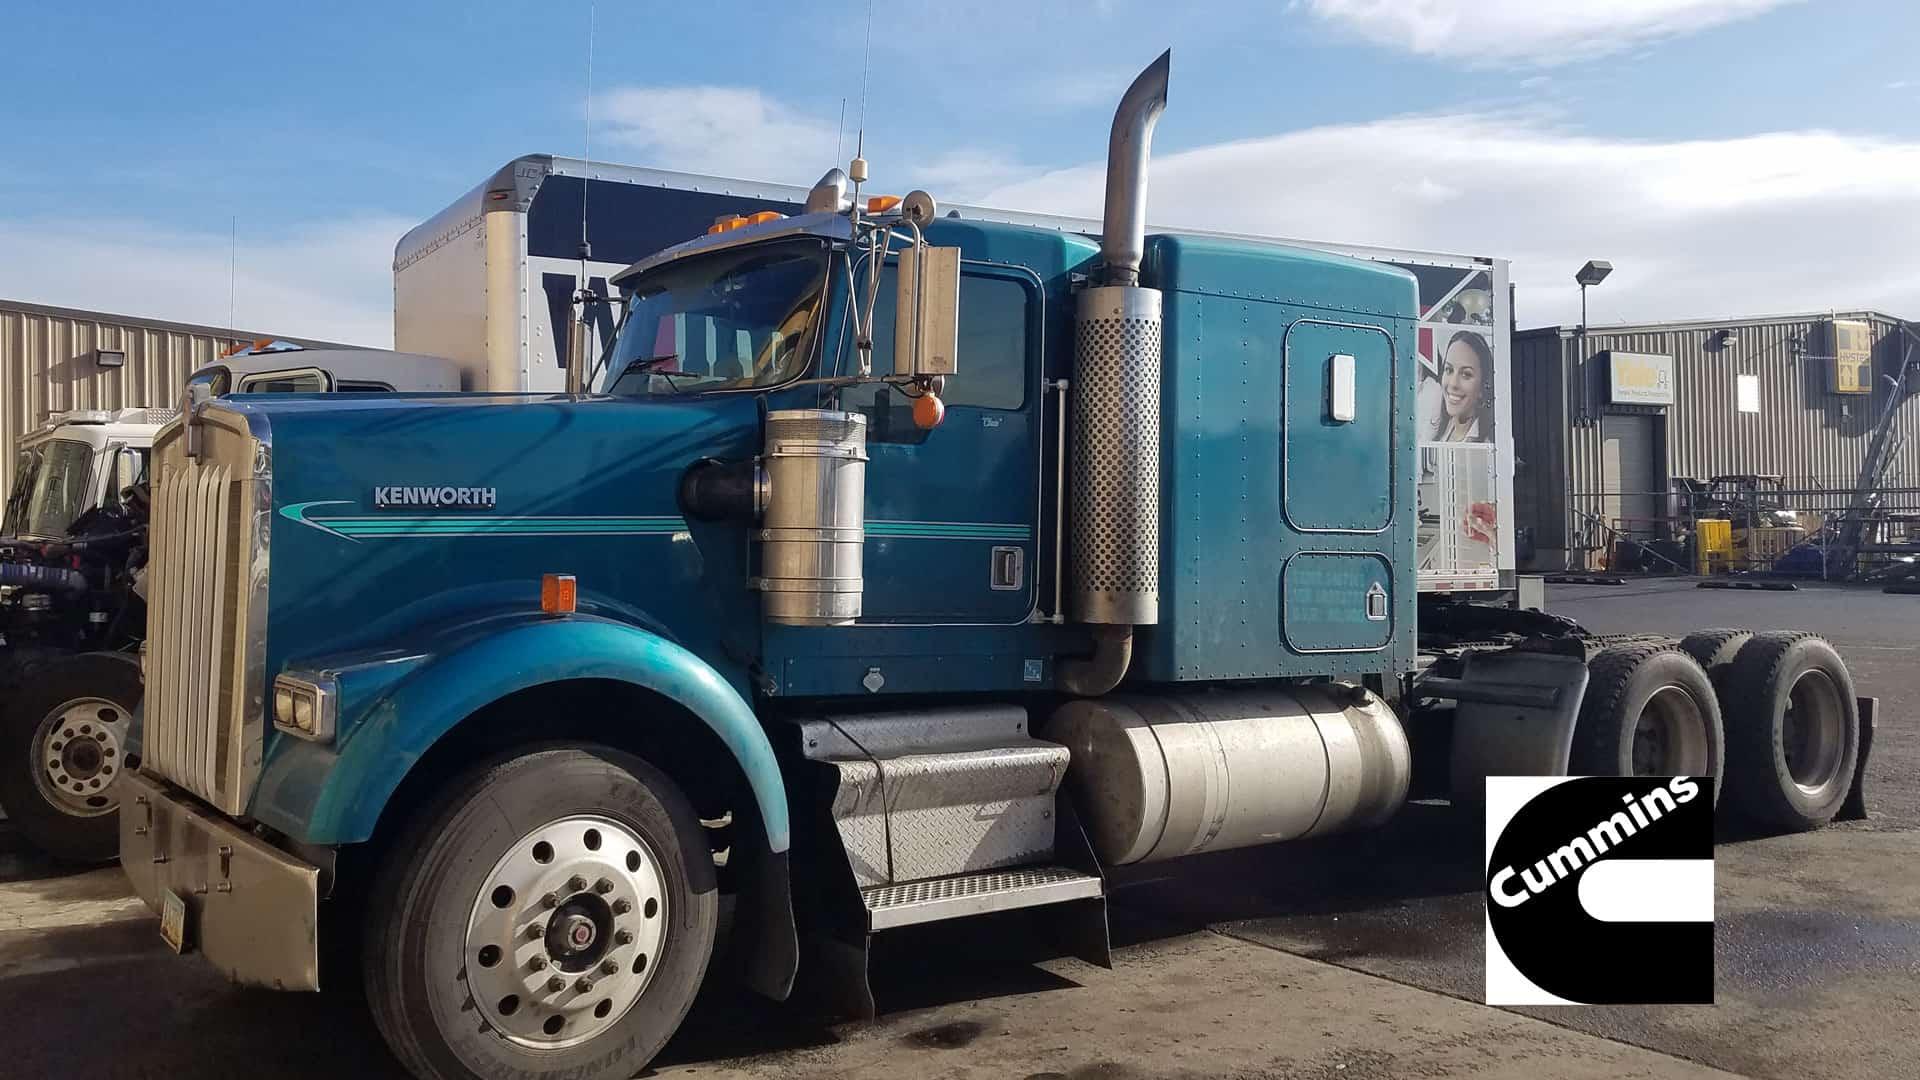 Cummins Engine Overhaul Financing Testimonial from Customer 10